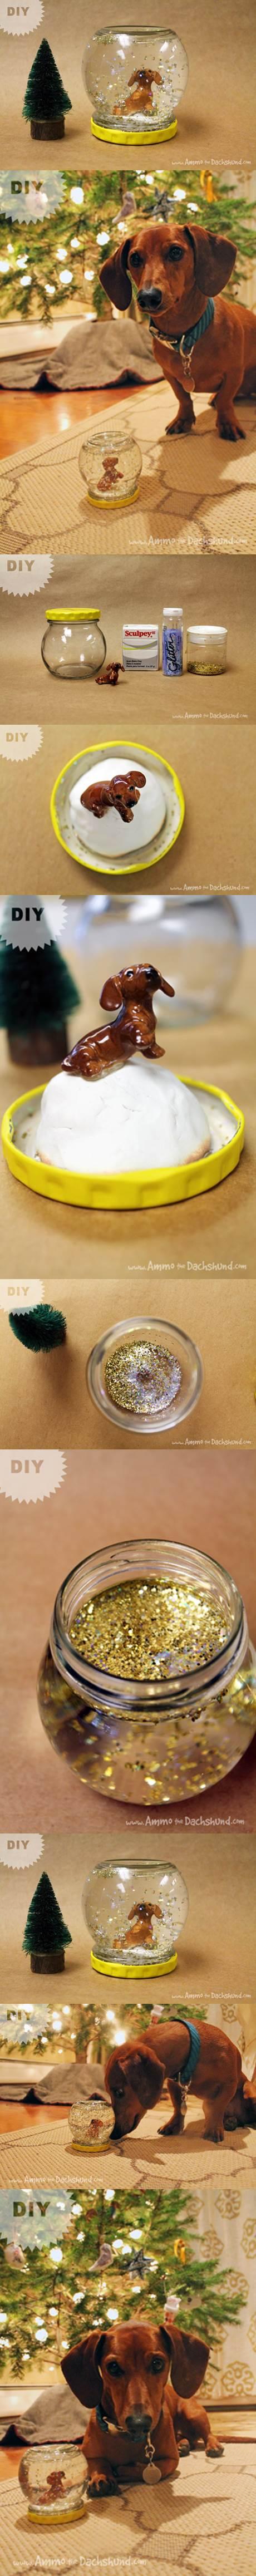 DIY Pet Snowglobes for Christmas 2